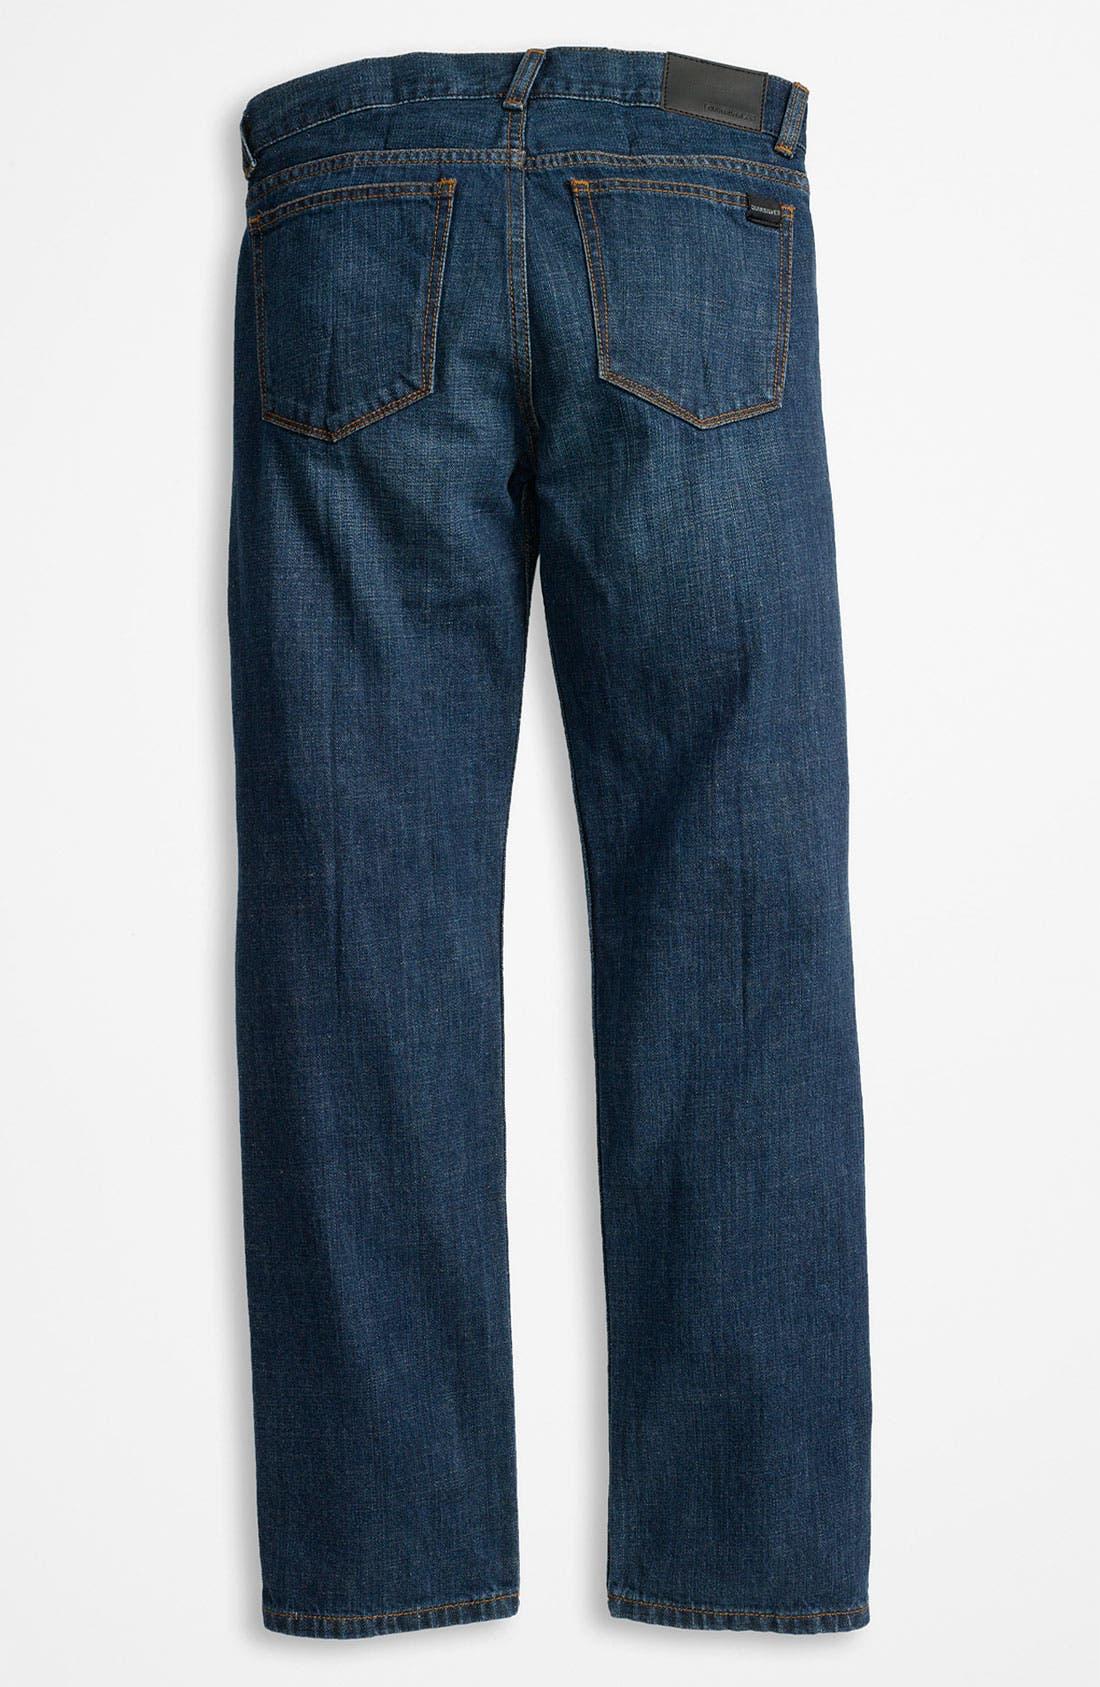 Main Image - Quiksilver 'Revolver' Jeans (Little Boys)